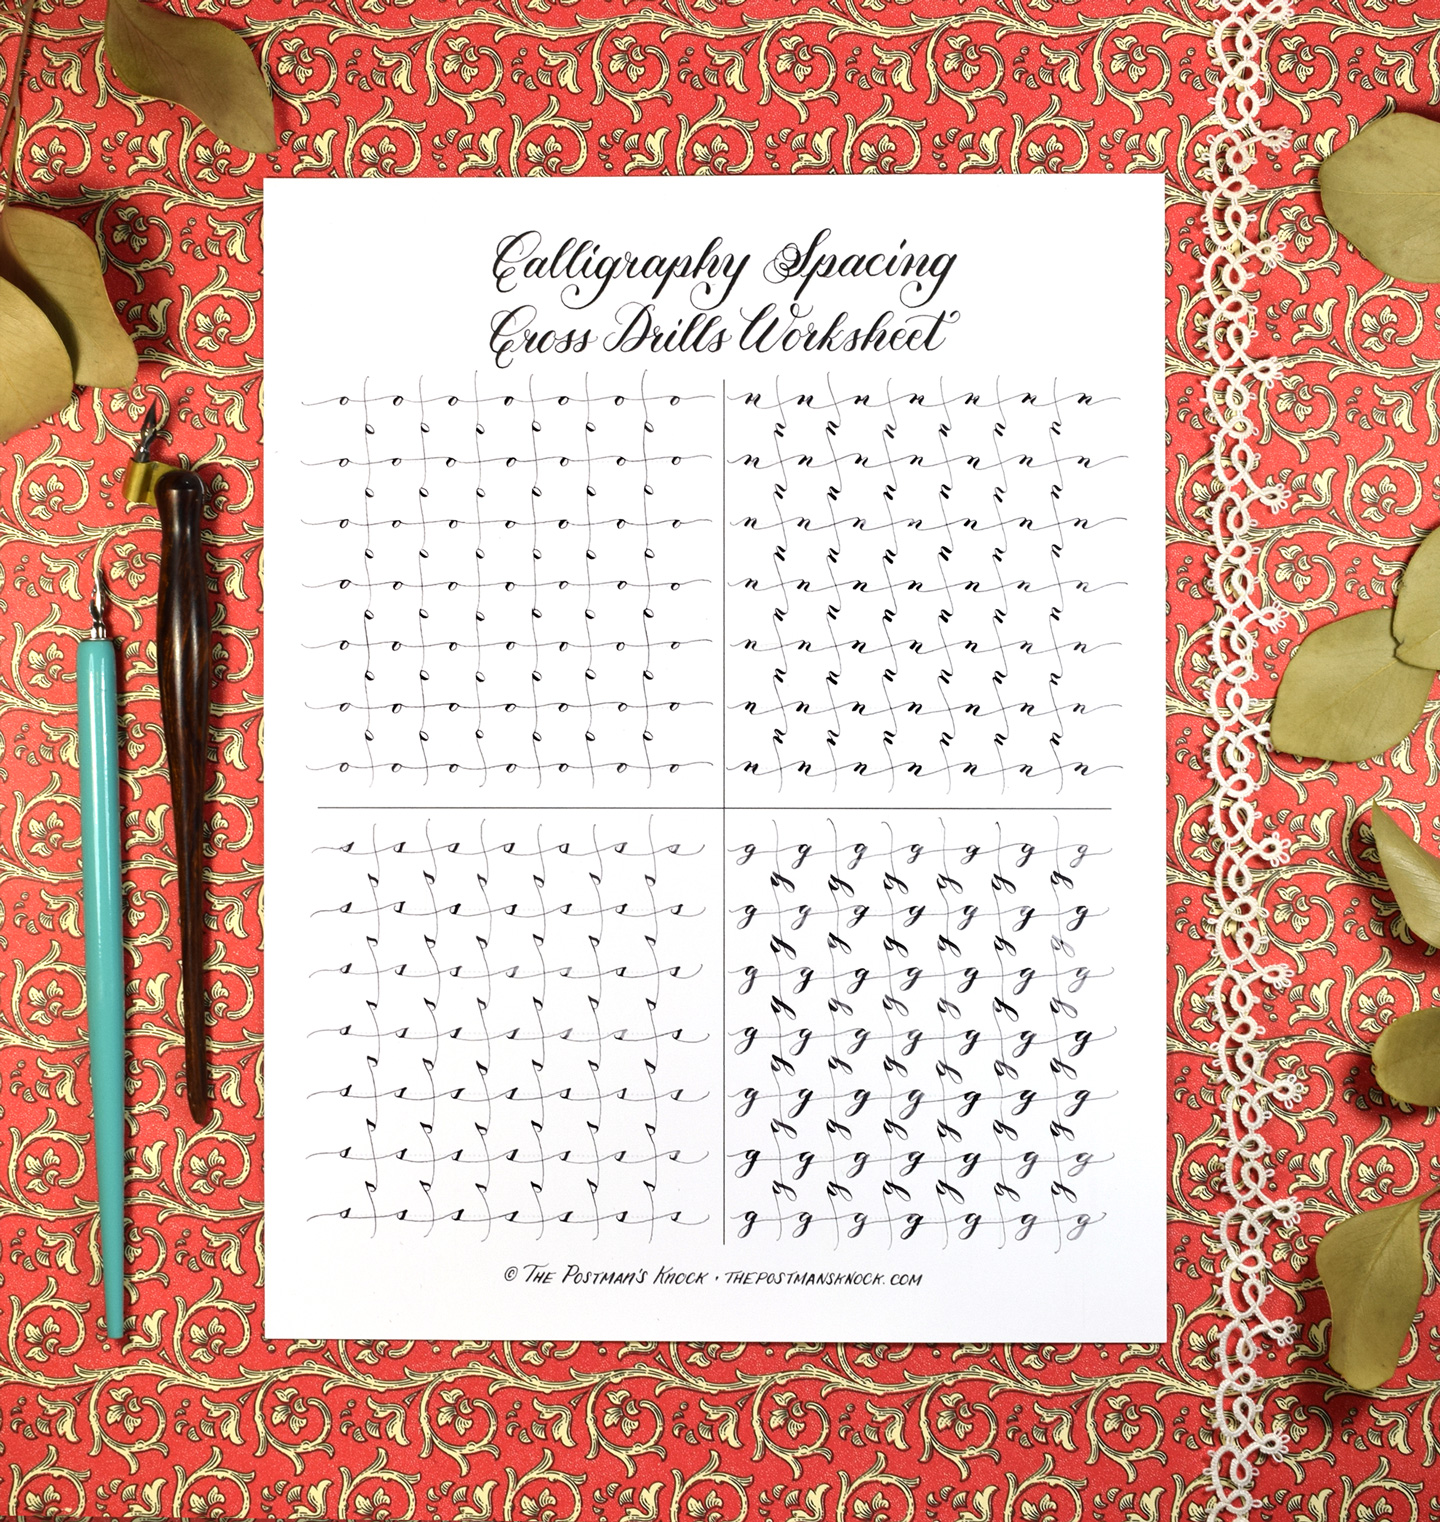 Free calligraphy spacing cross drills worksheet the